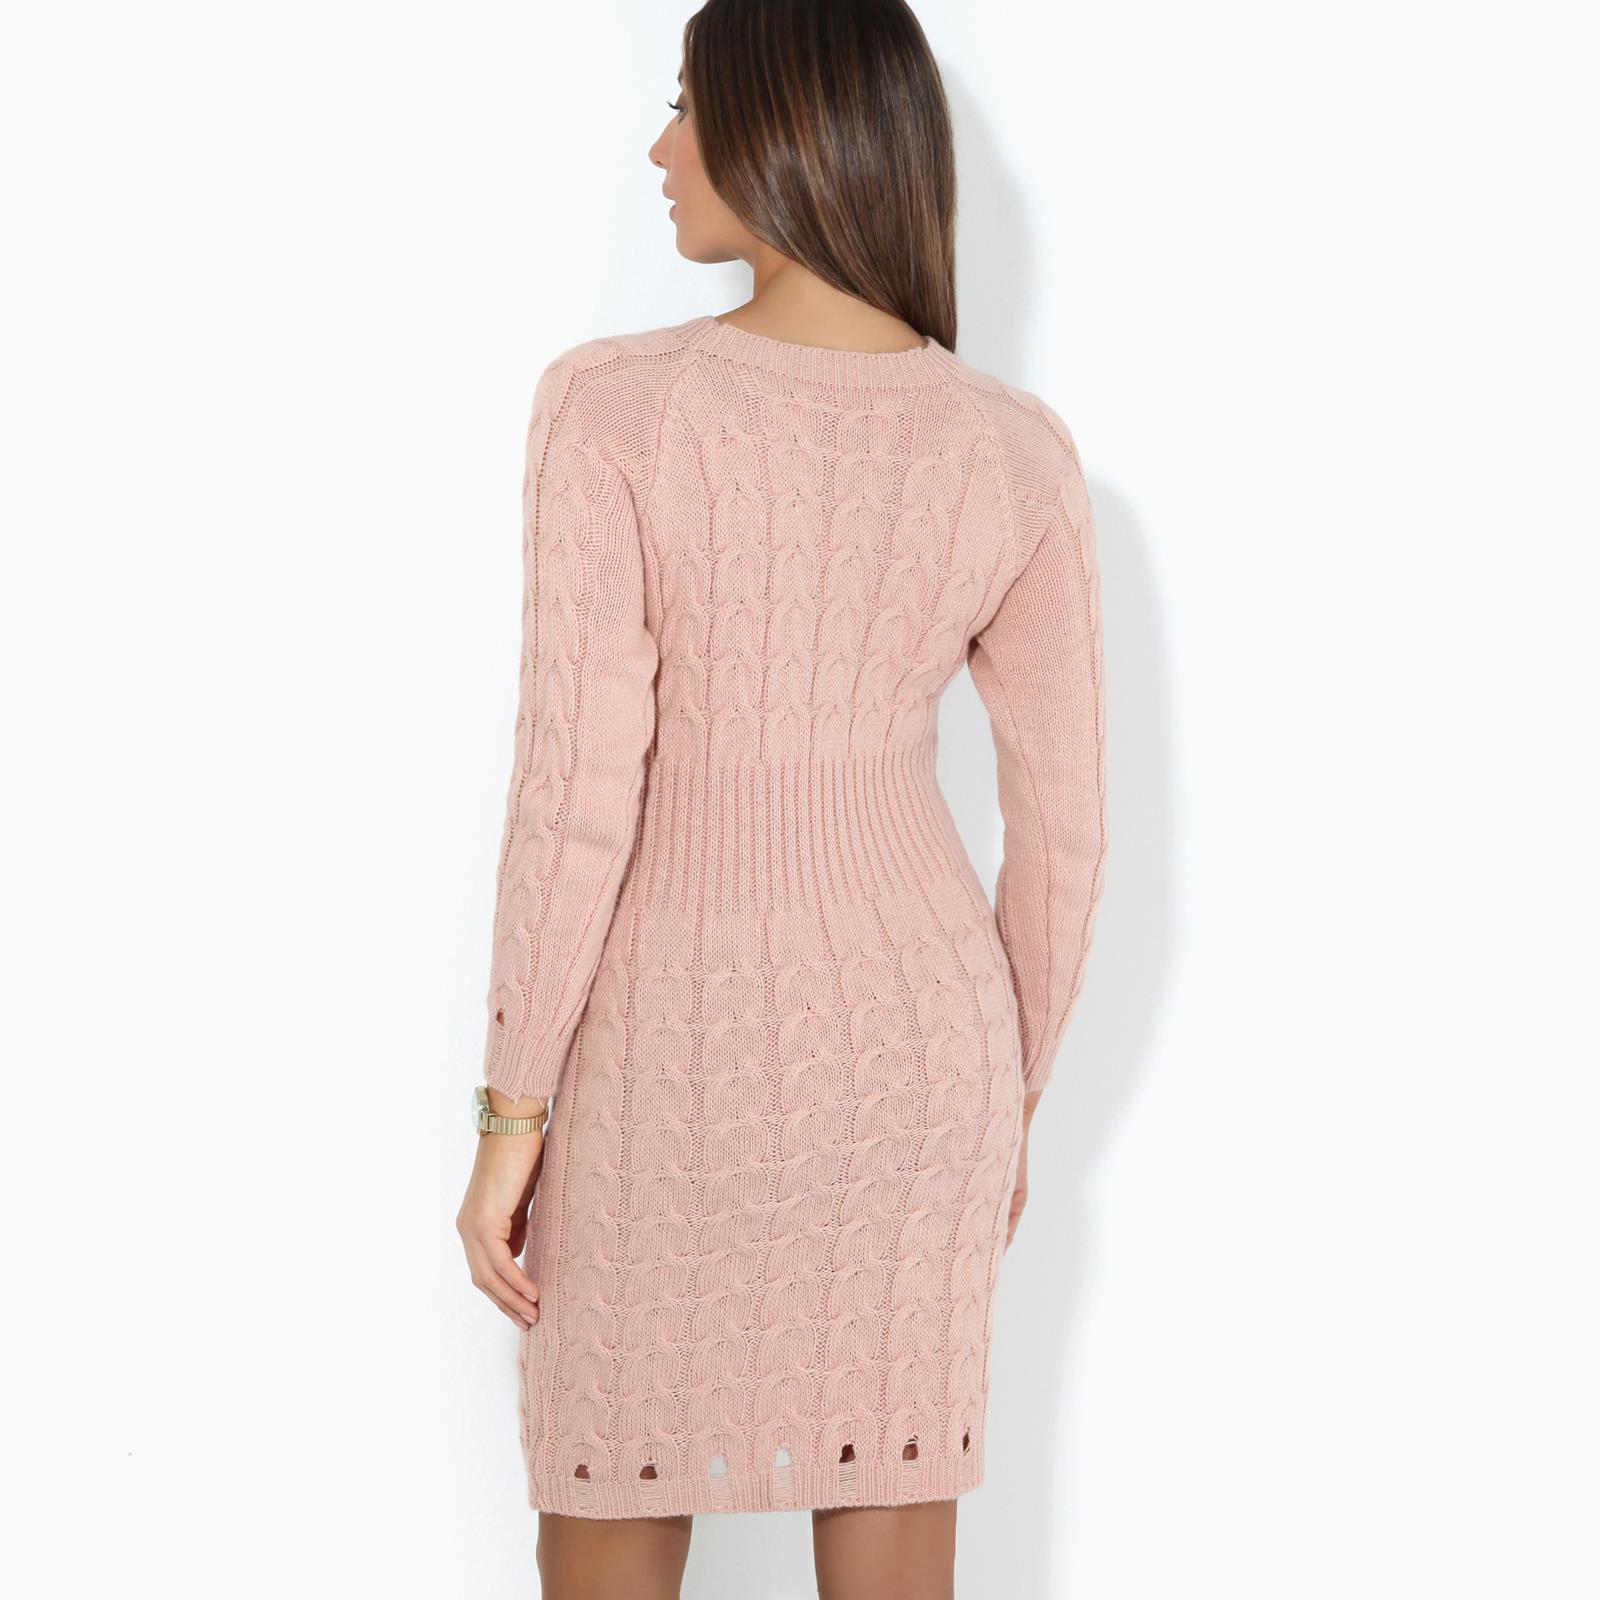 Womens-Ladies-Jumper-Dress-Longsleeve-Mini-Warm-Winter-Knit-Top-Bodycon thumbnail 16